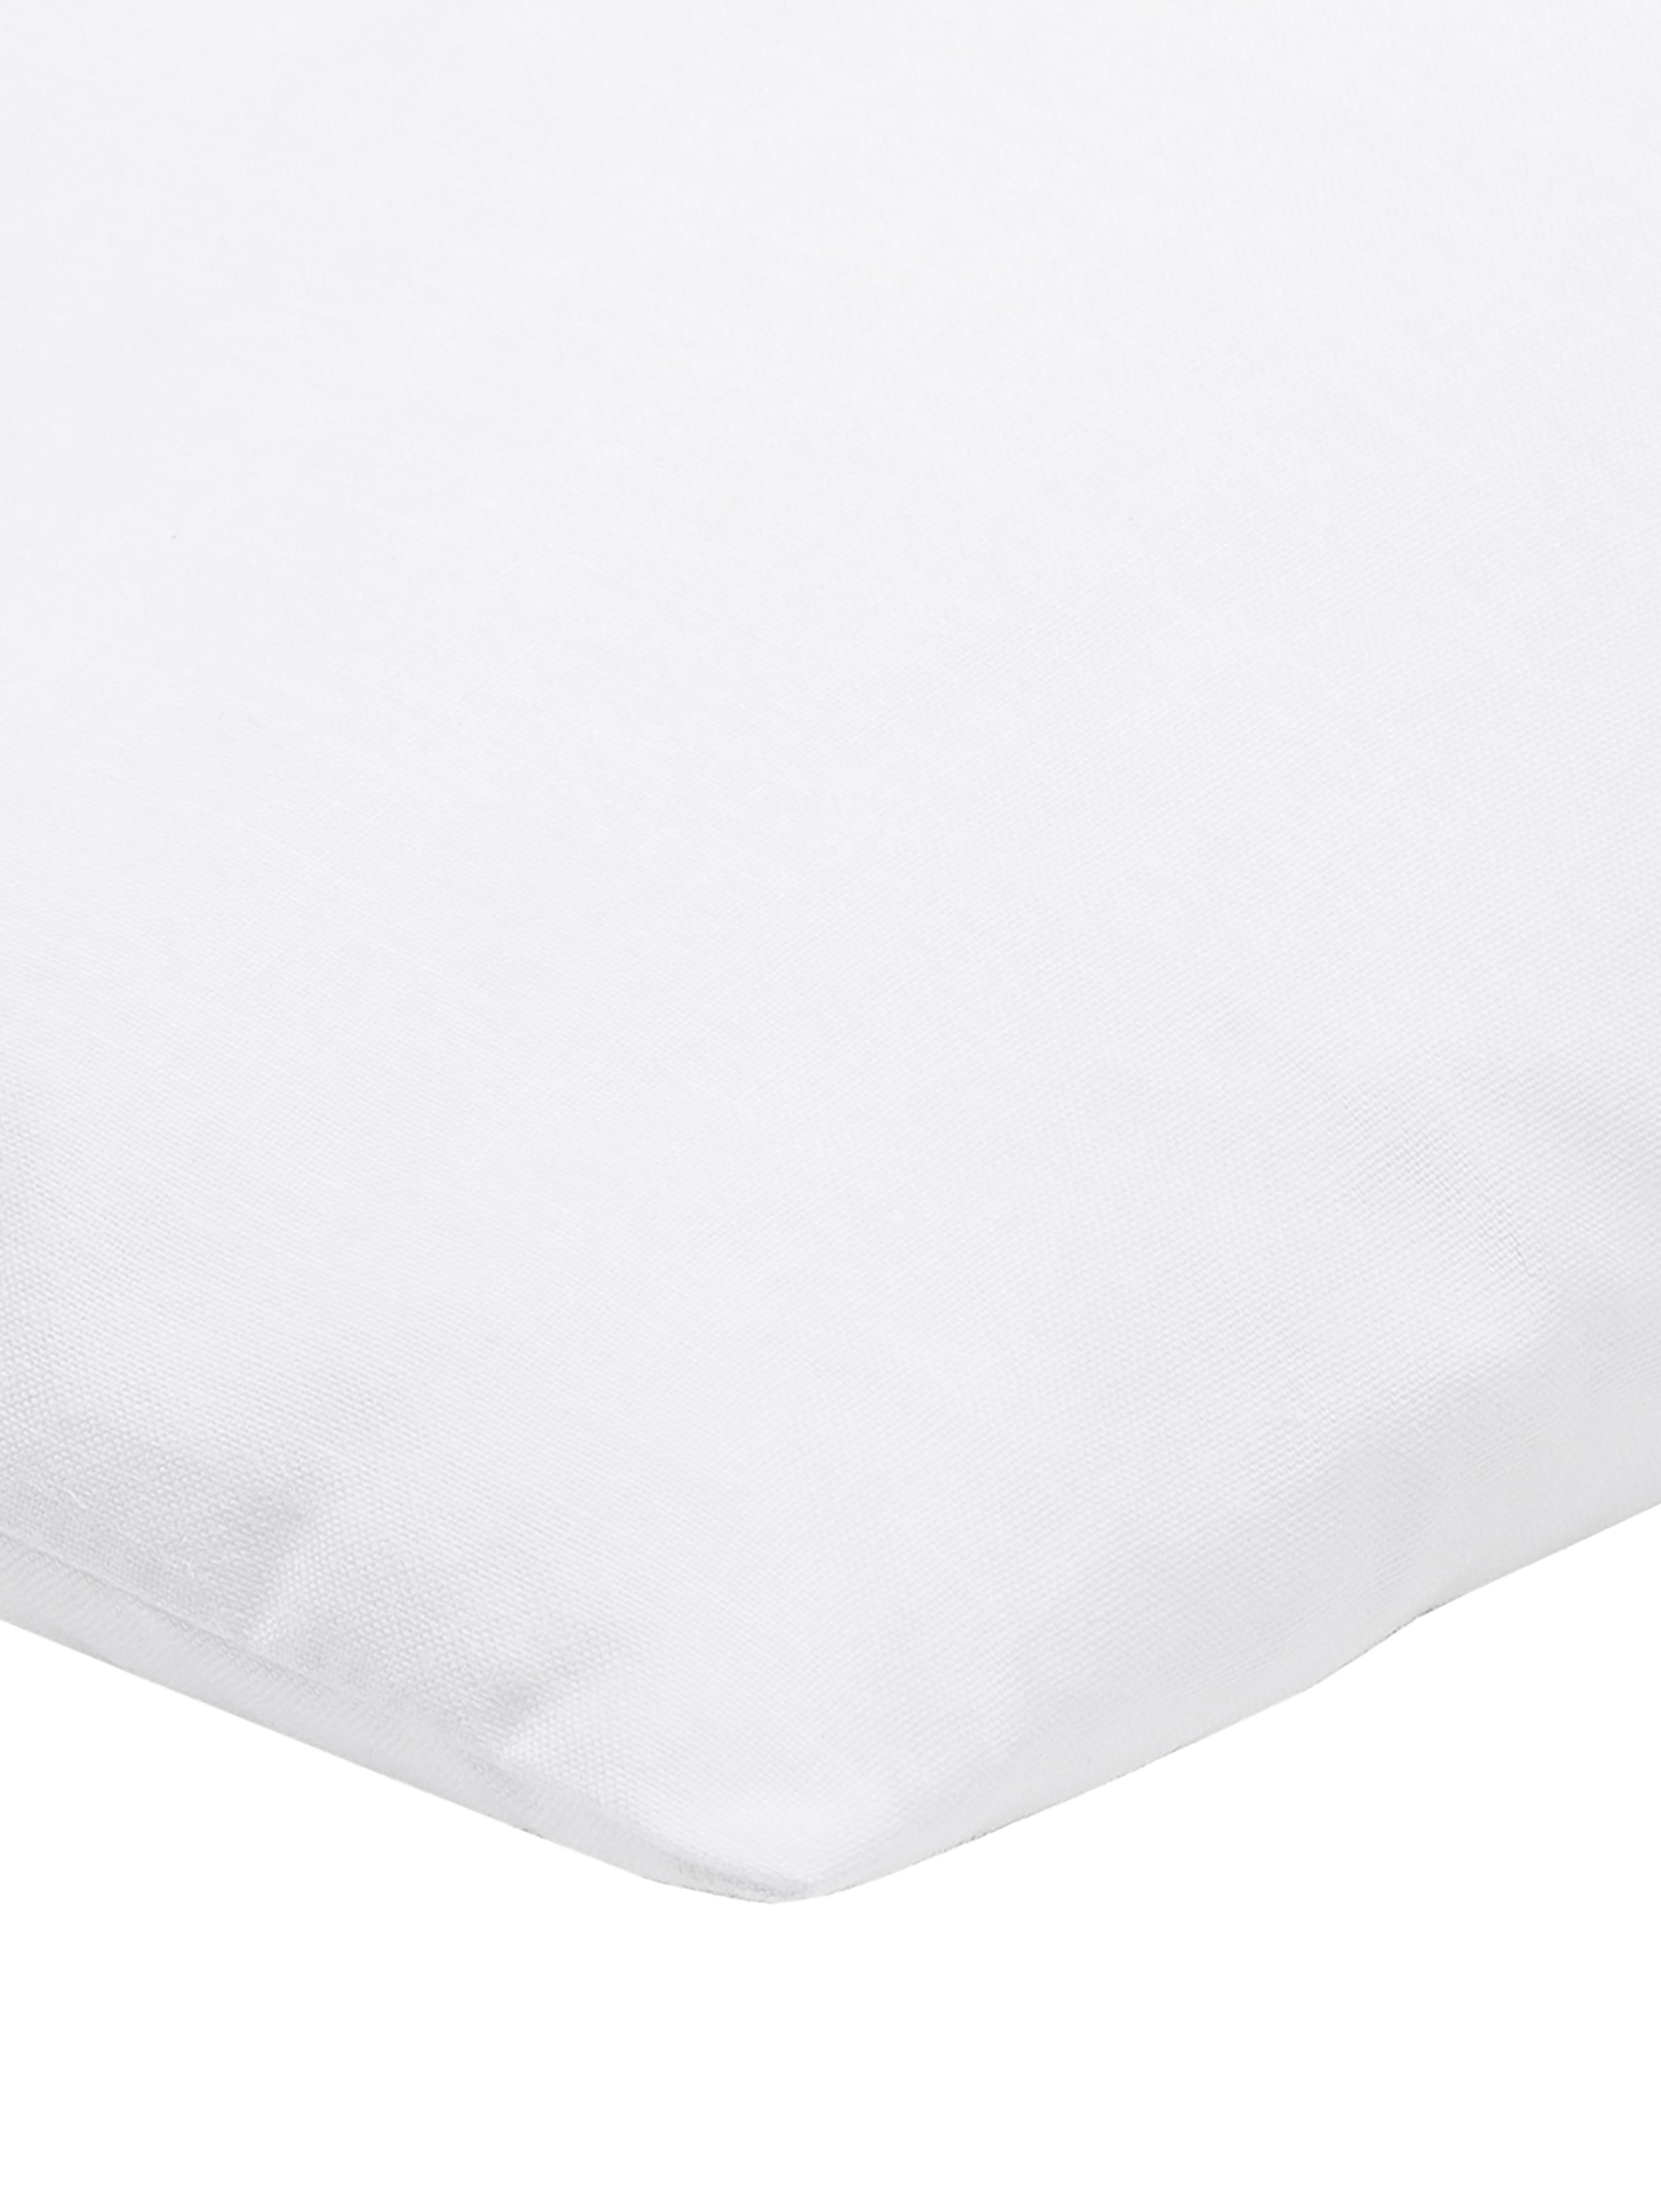 Imbottitura per cuscini in microfibra Sia, 30 x 50, Bianco, Larg. 30 x Lung. 50 cm